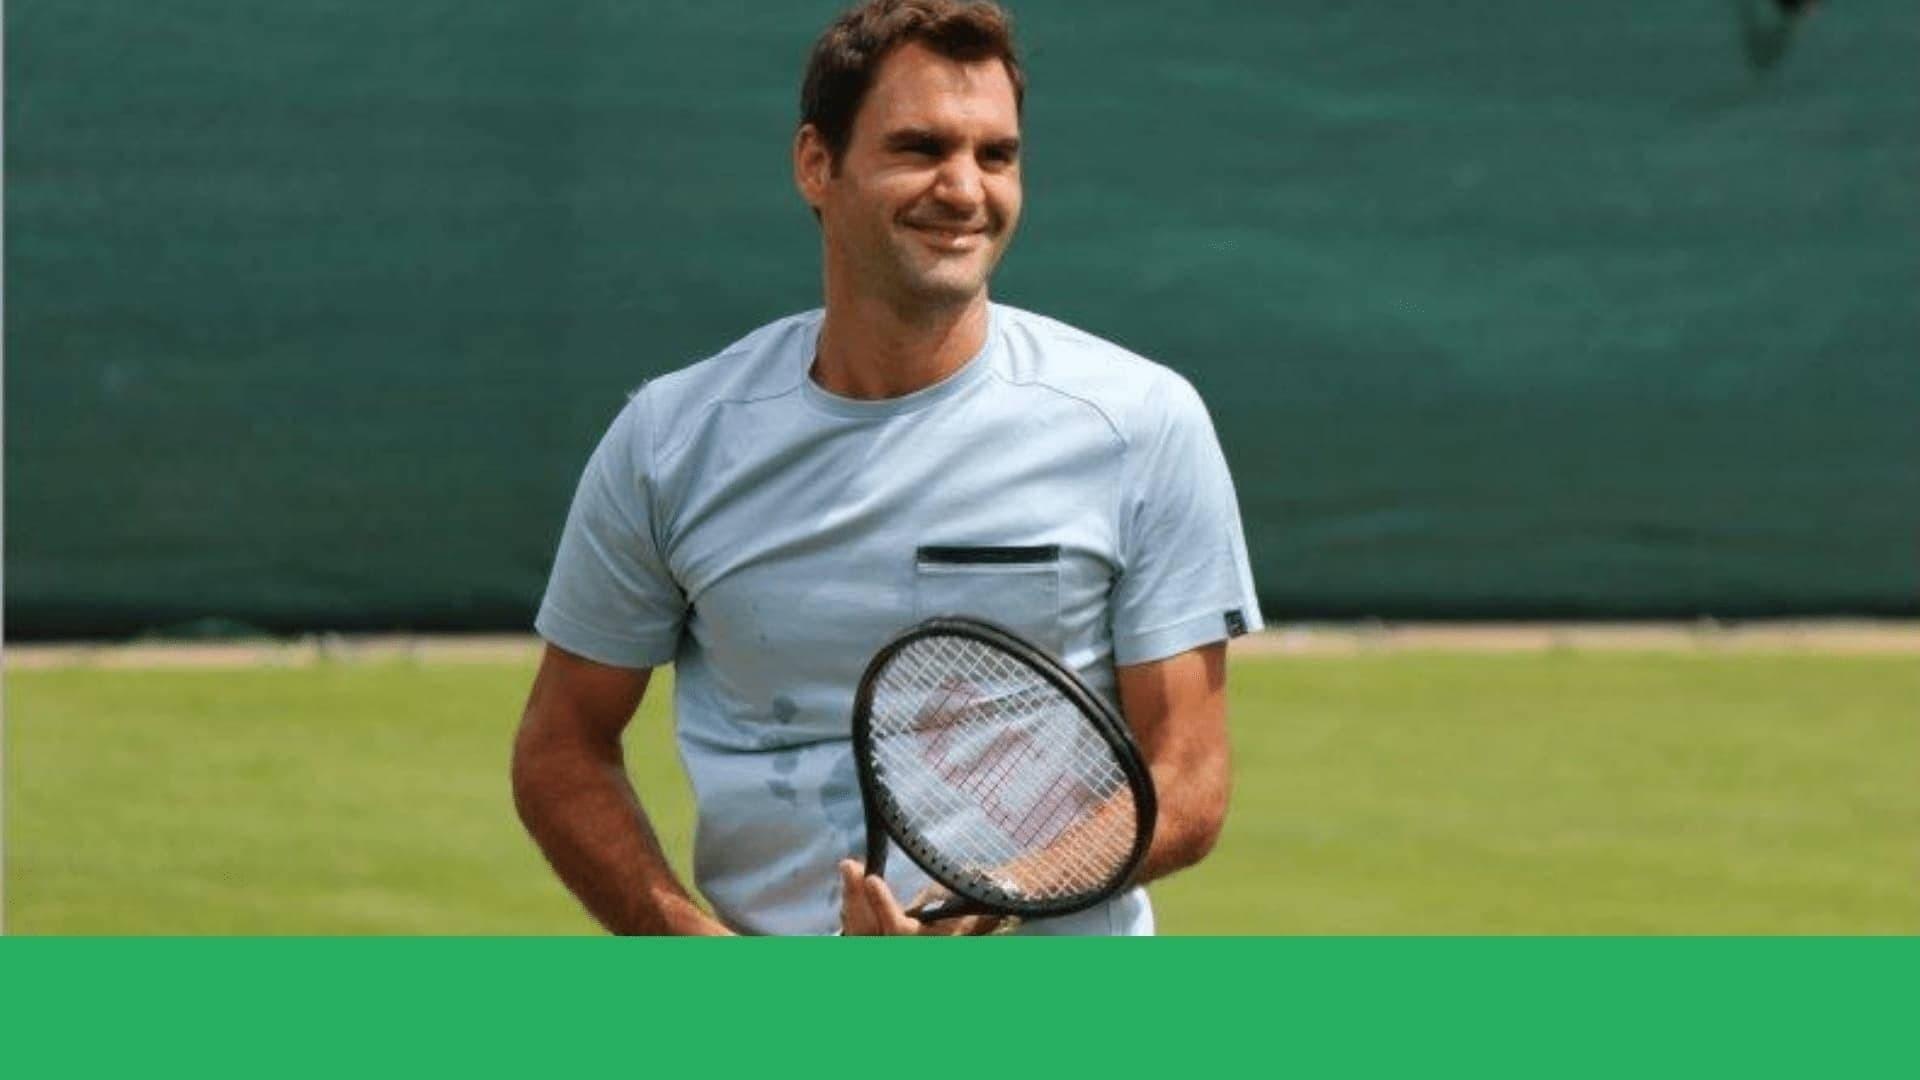 pro-tennis-player